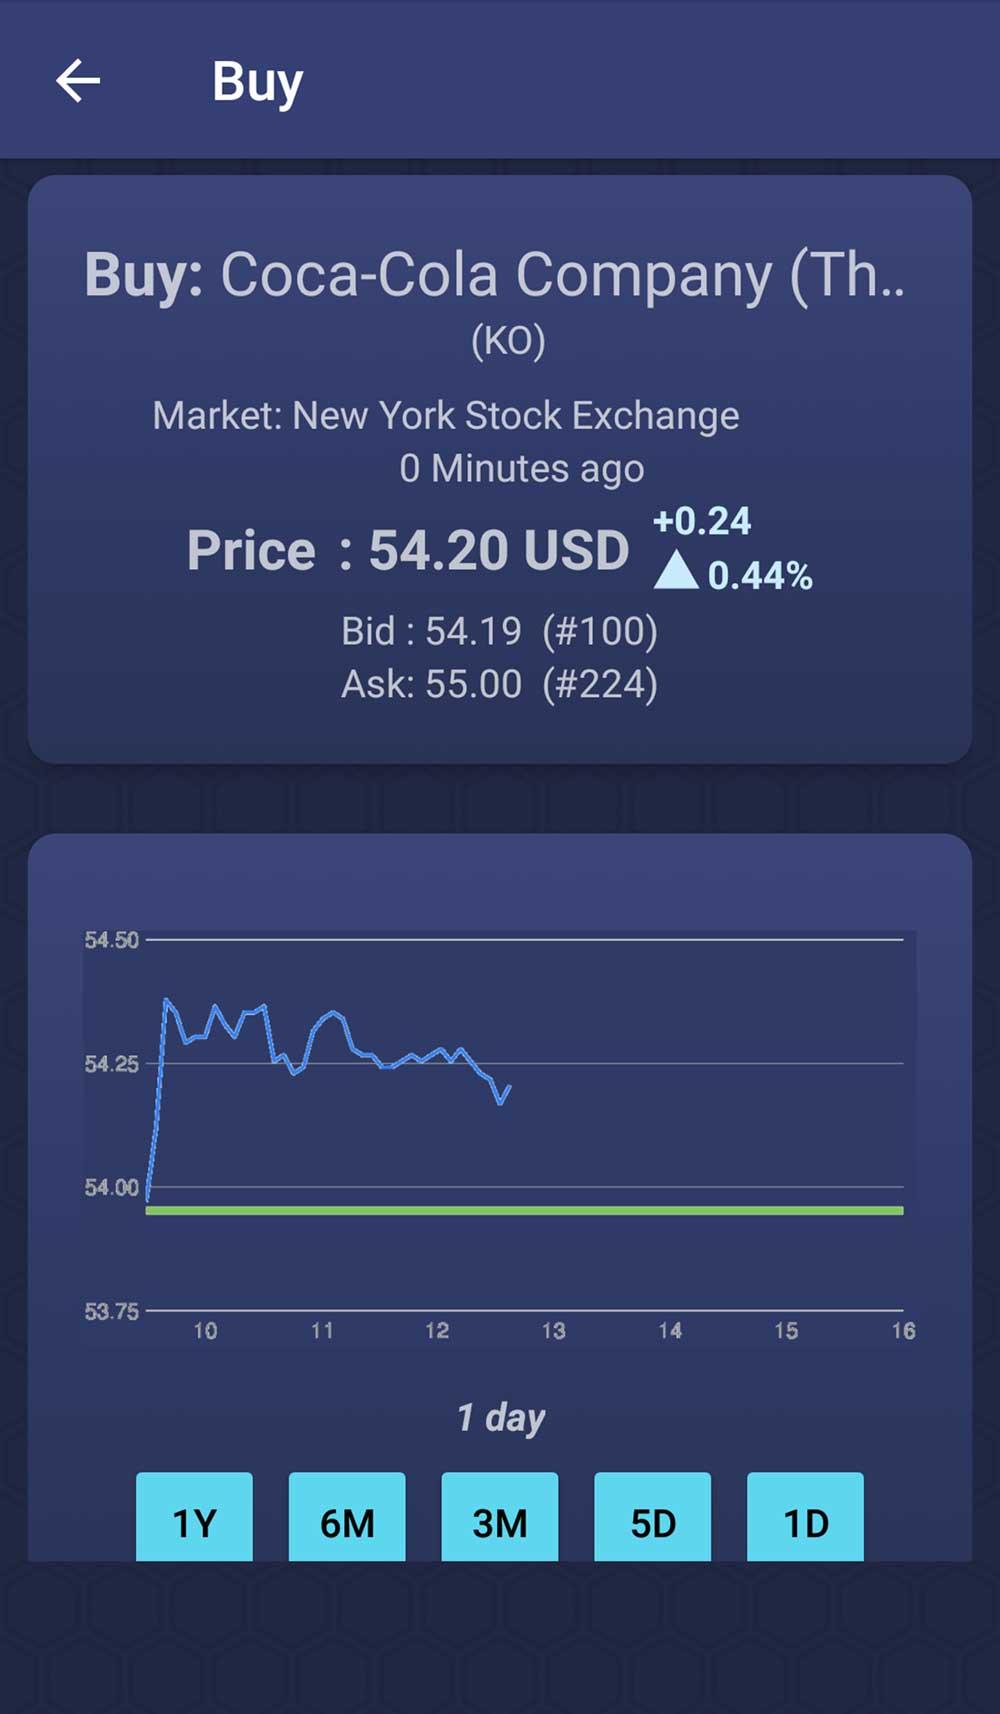 Investopedia stock market simulator